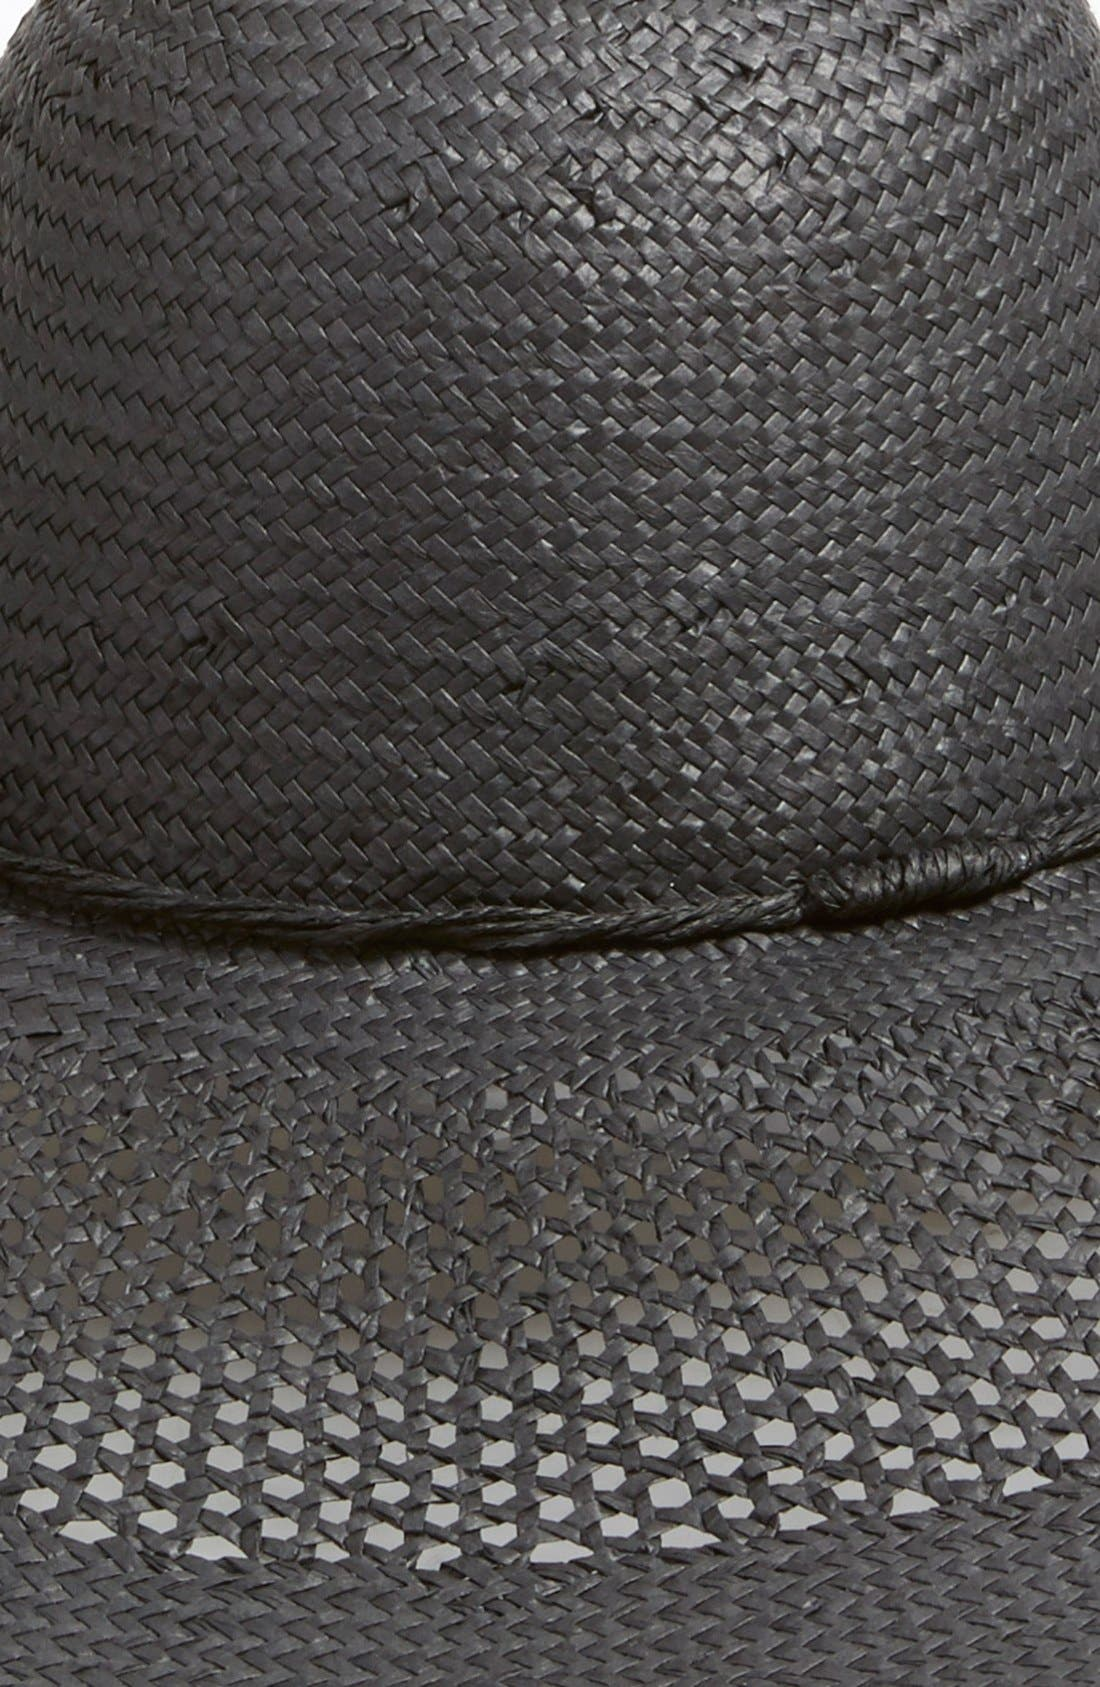 Alternate Image 2  - Phase 3 Open Weave Floppy Straw Hat